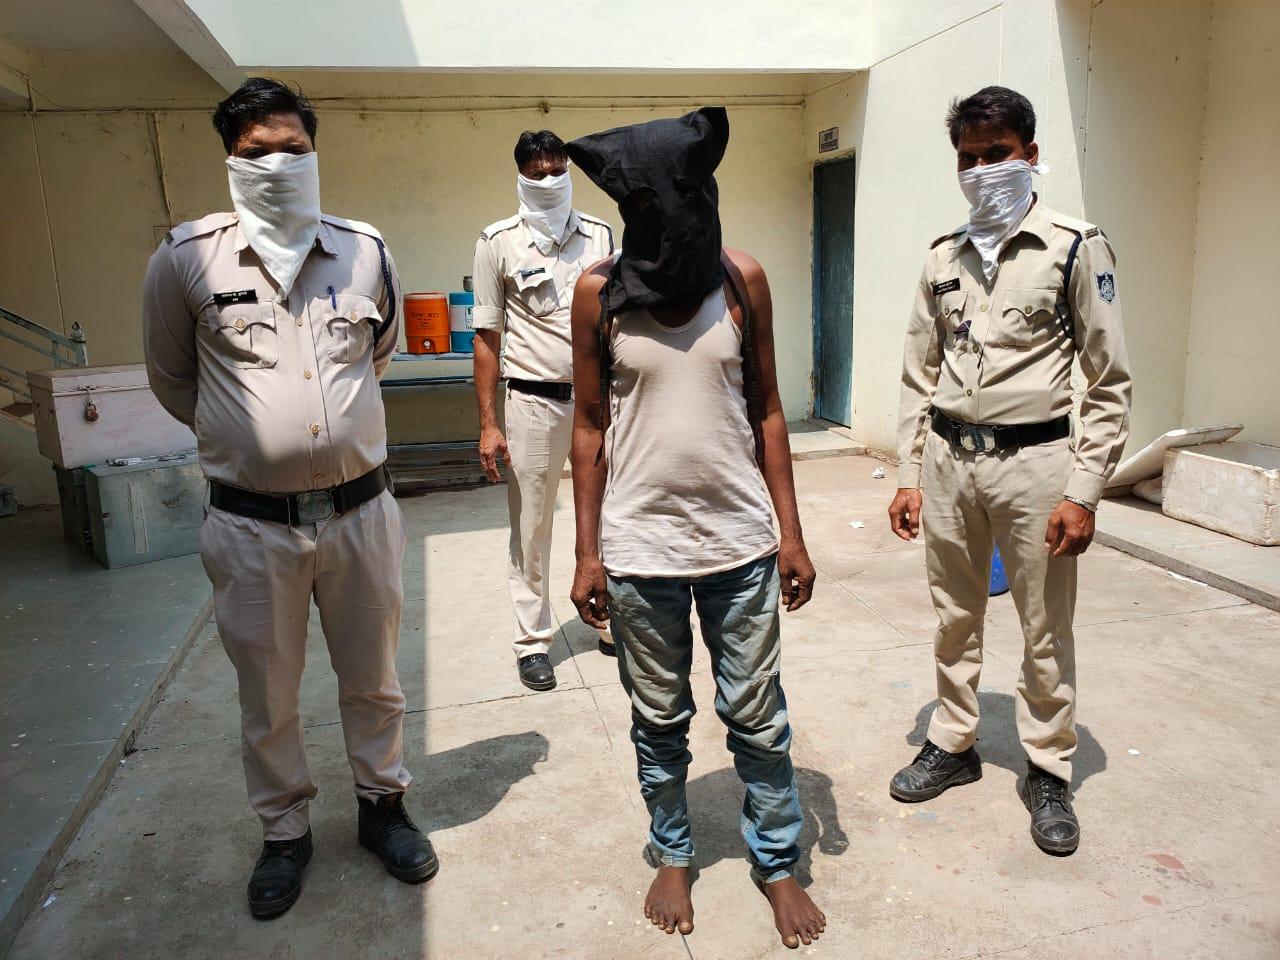 लूट डकैती के कुख्यात आरोपी गिरफ्तार